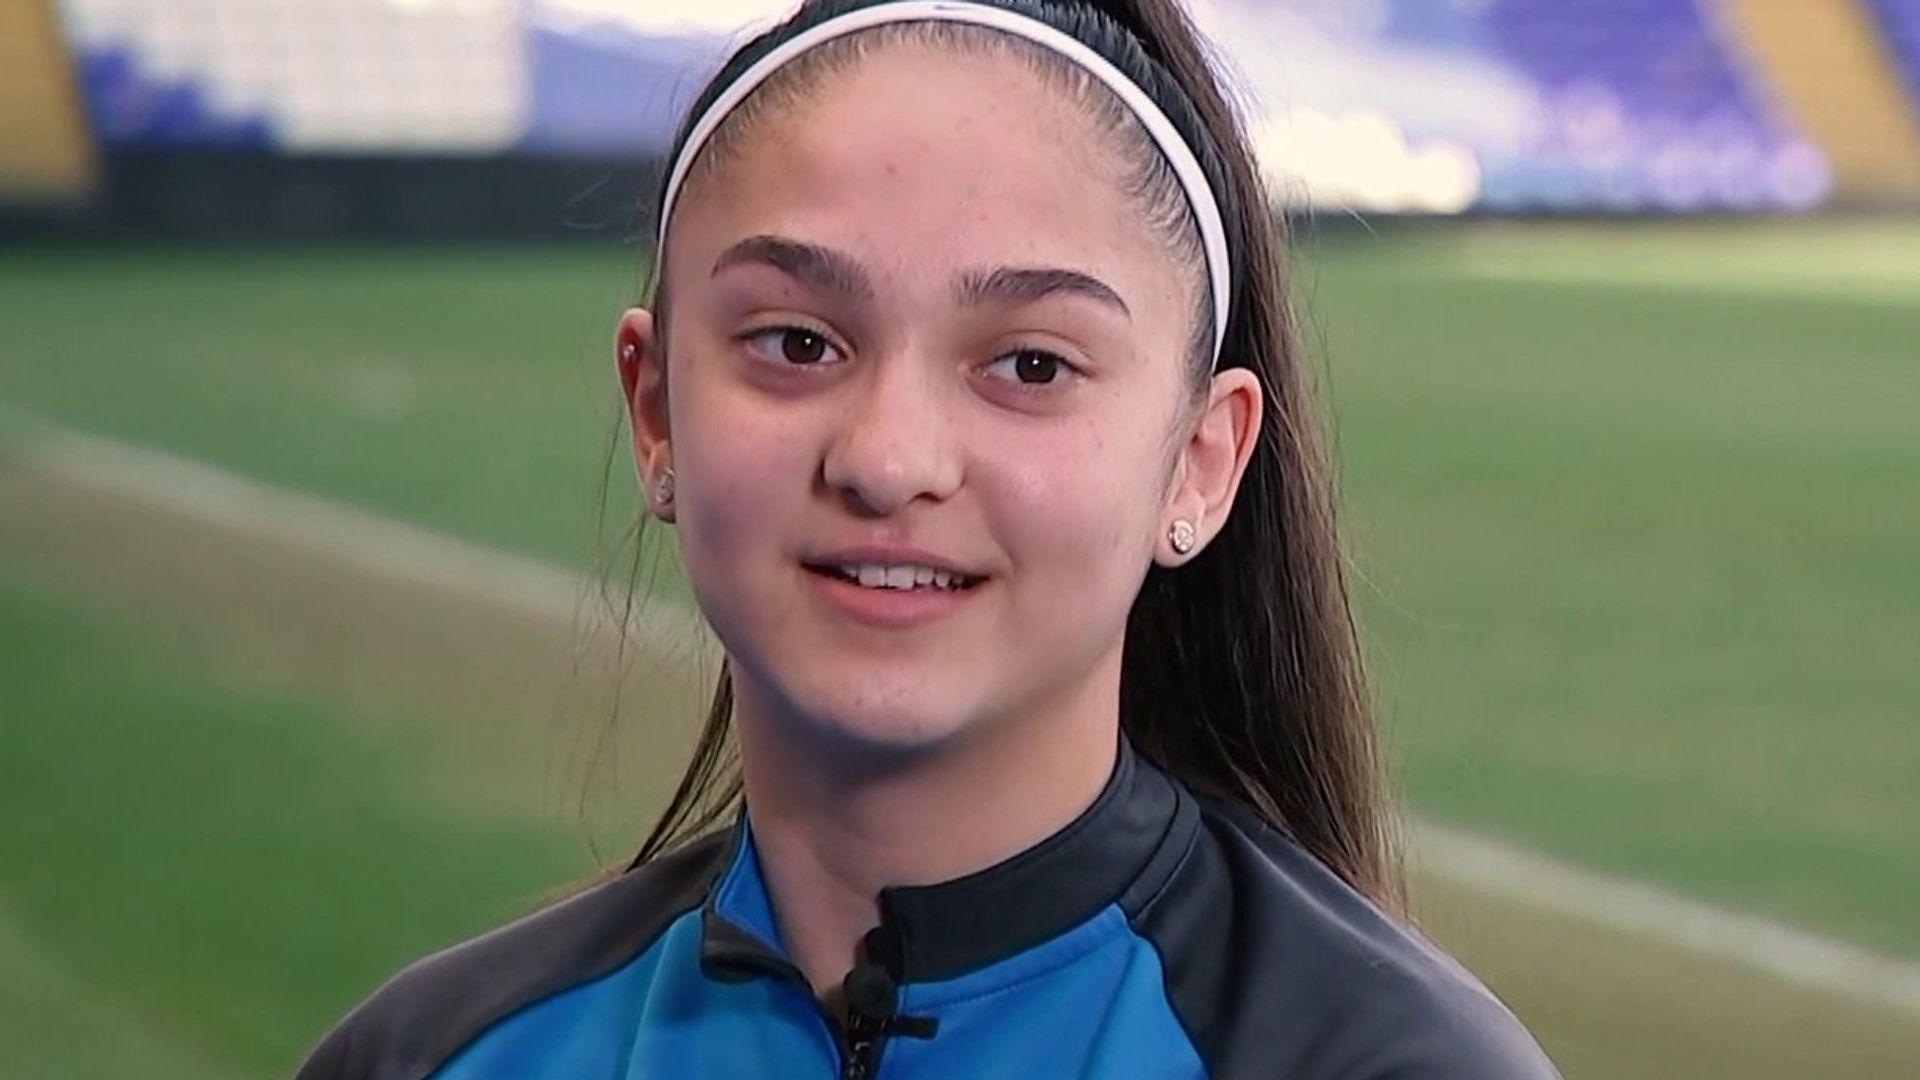 Layla Banaras: My dream to play for England